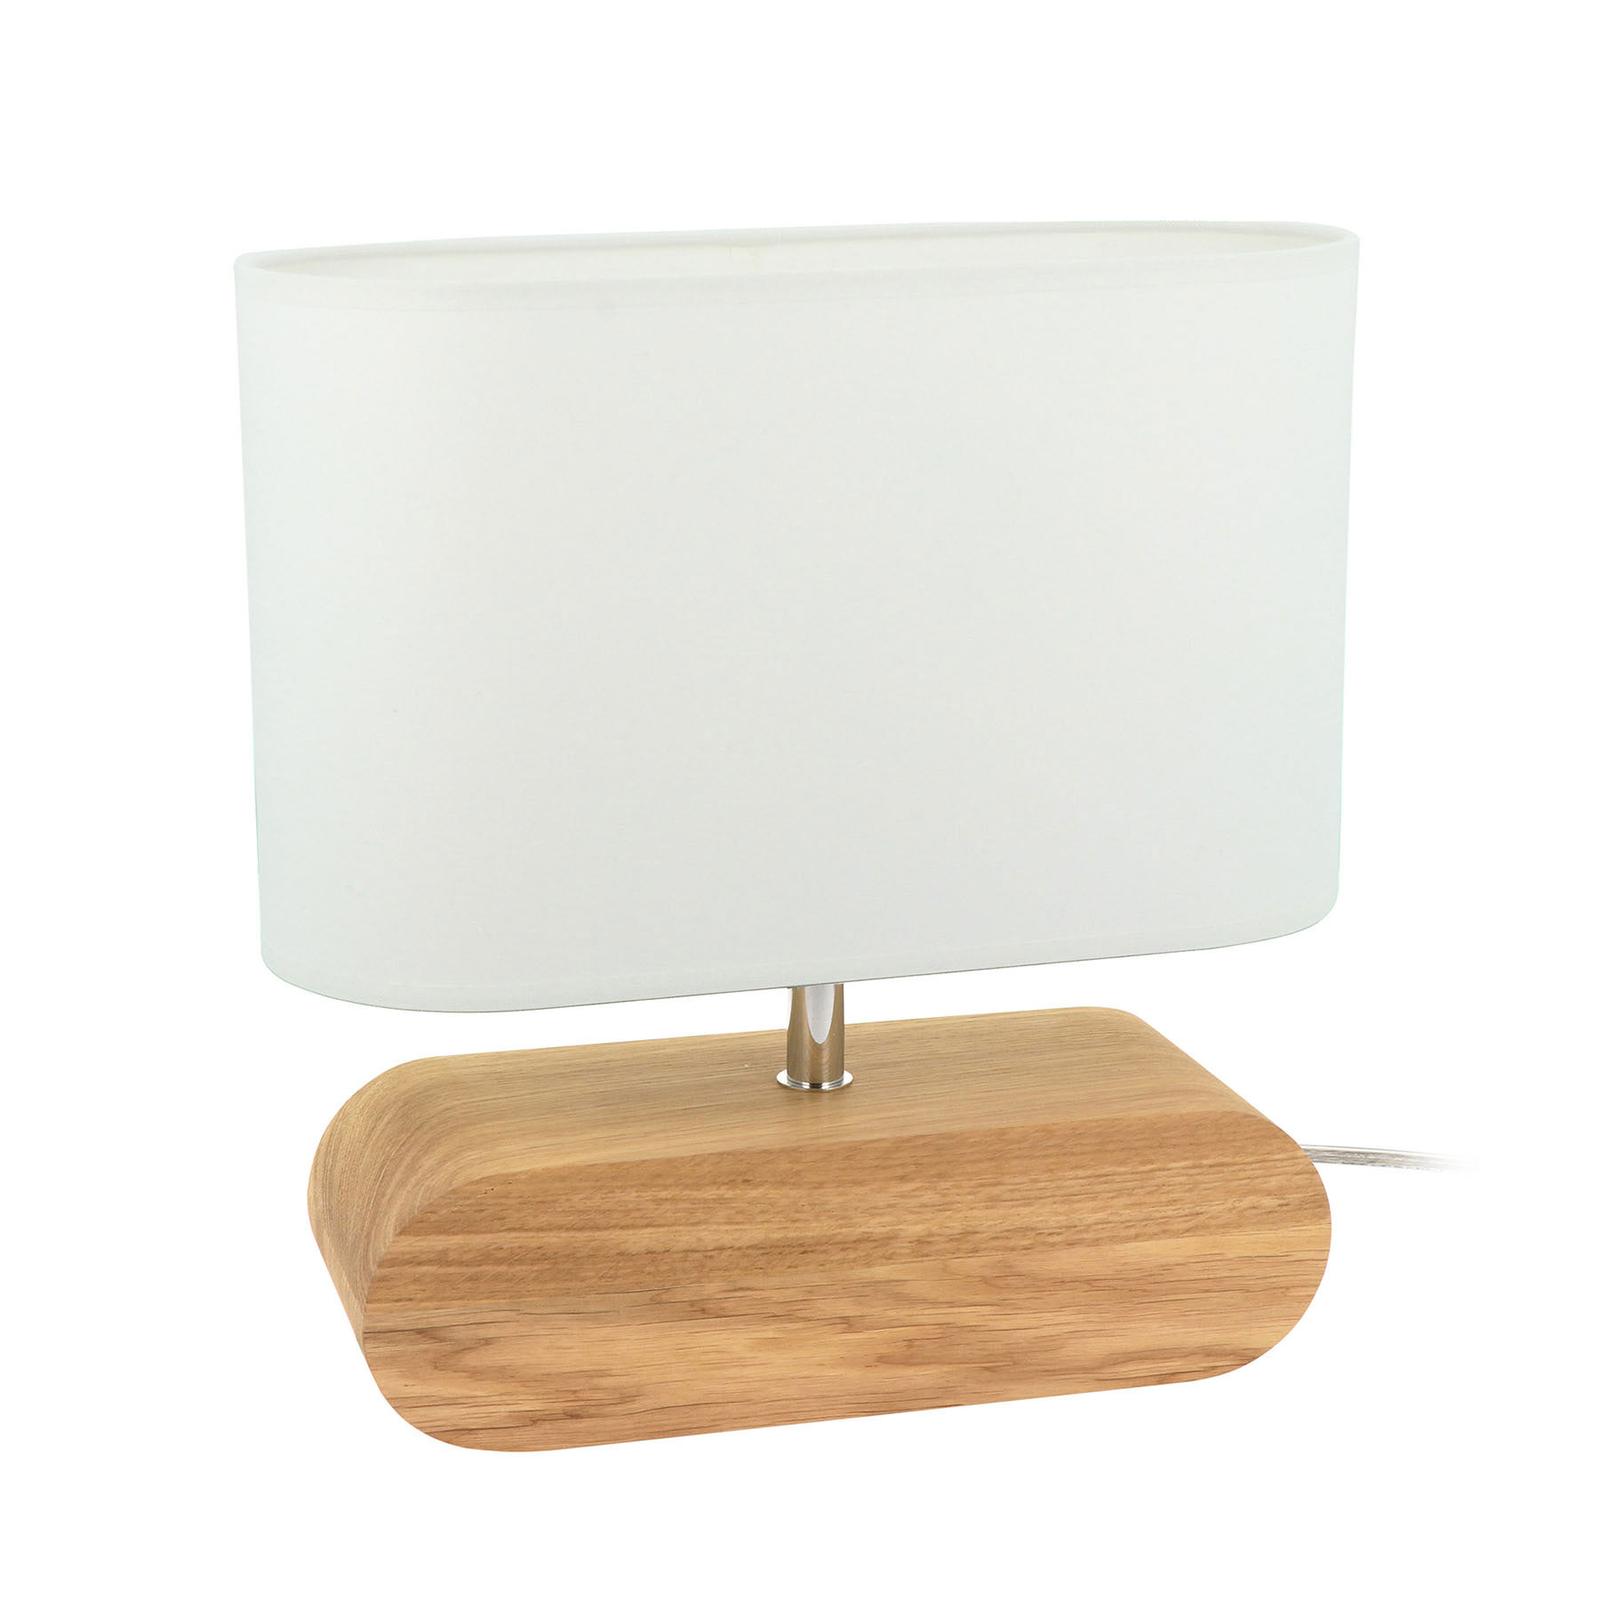 Lampe à poser Cassy chêne abat-jour en tissu blanc